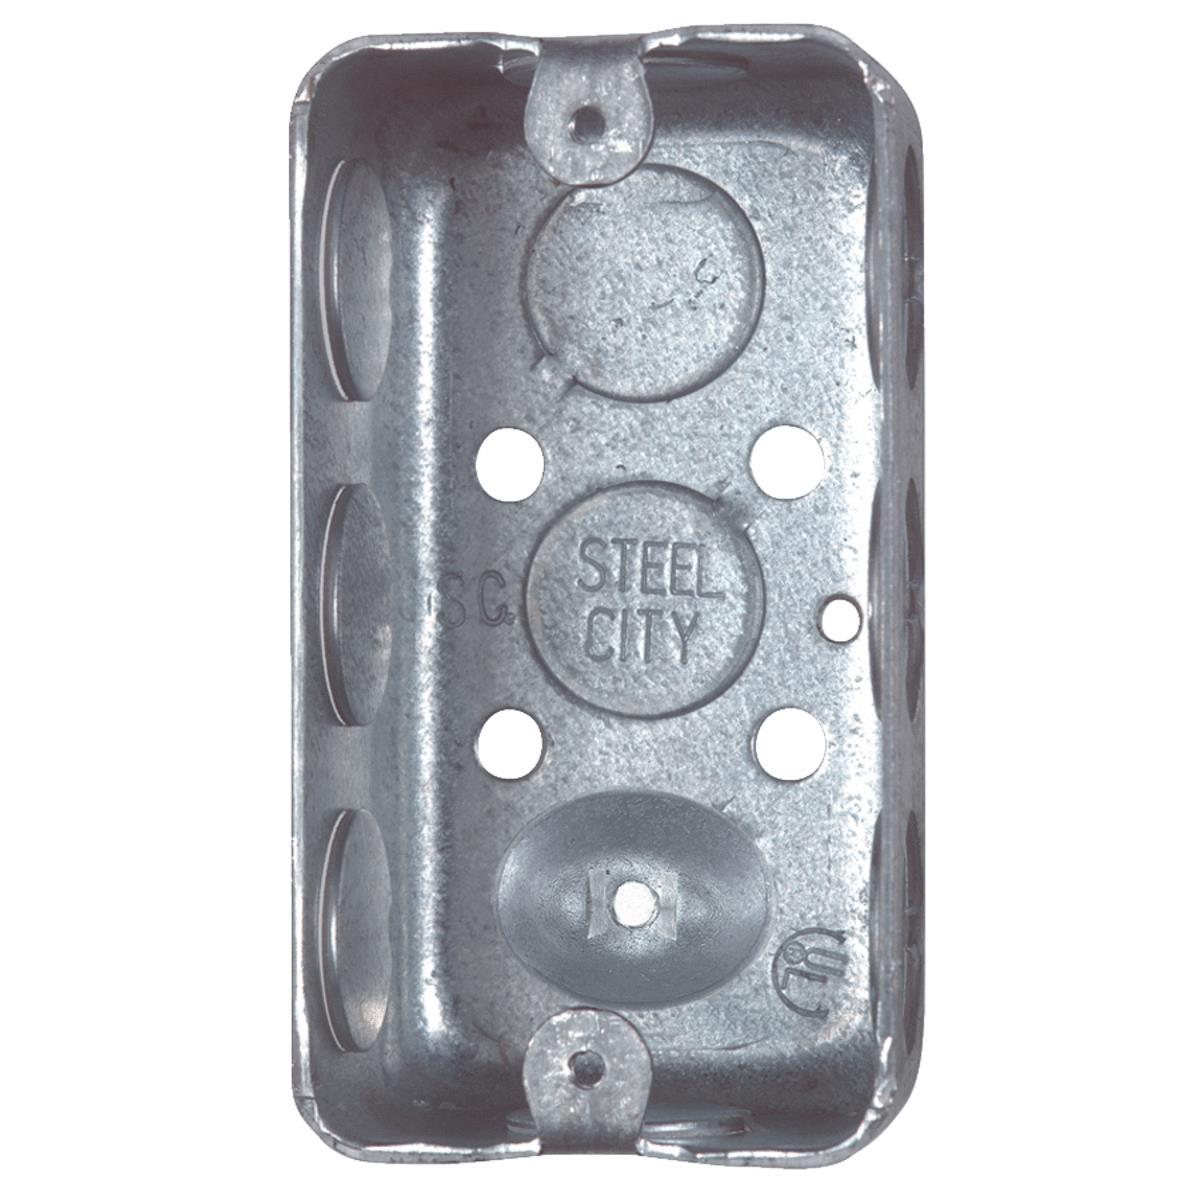 Buy Steel City Handy Box Metallic